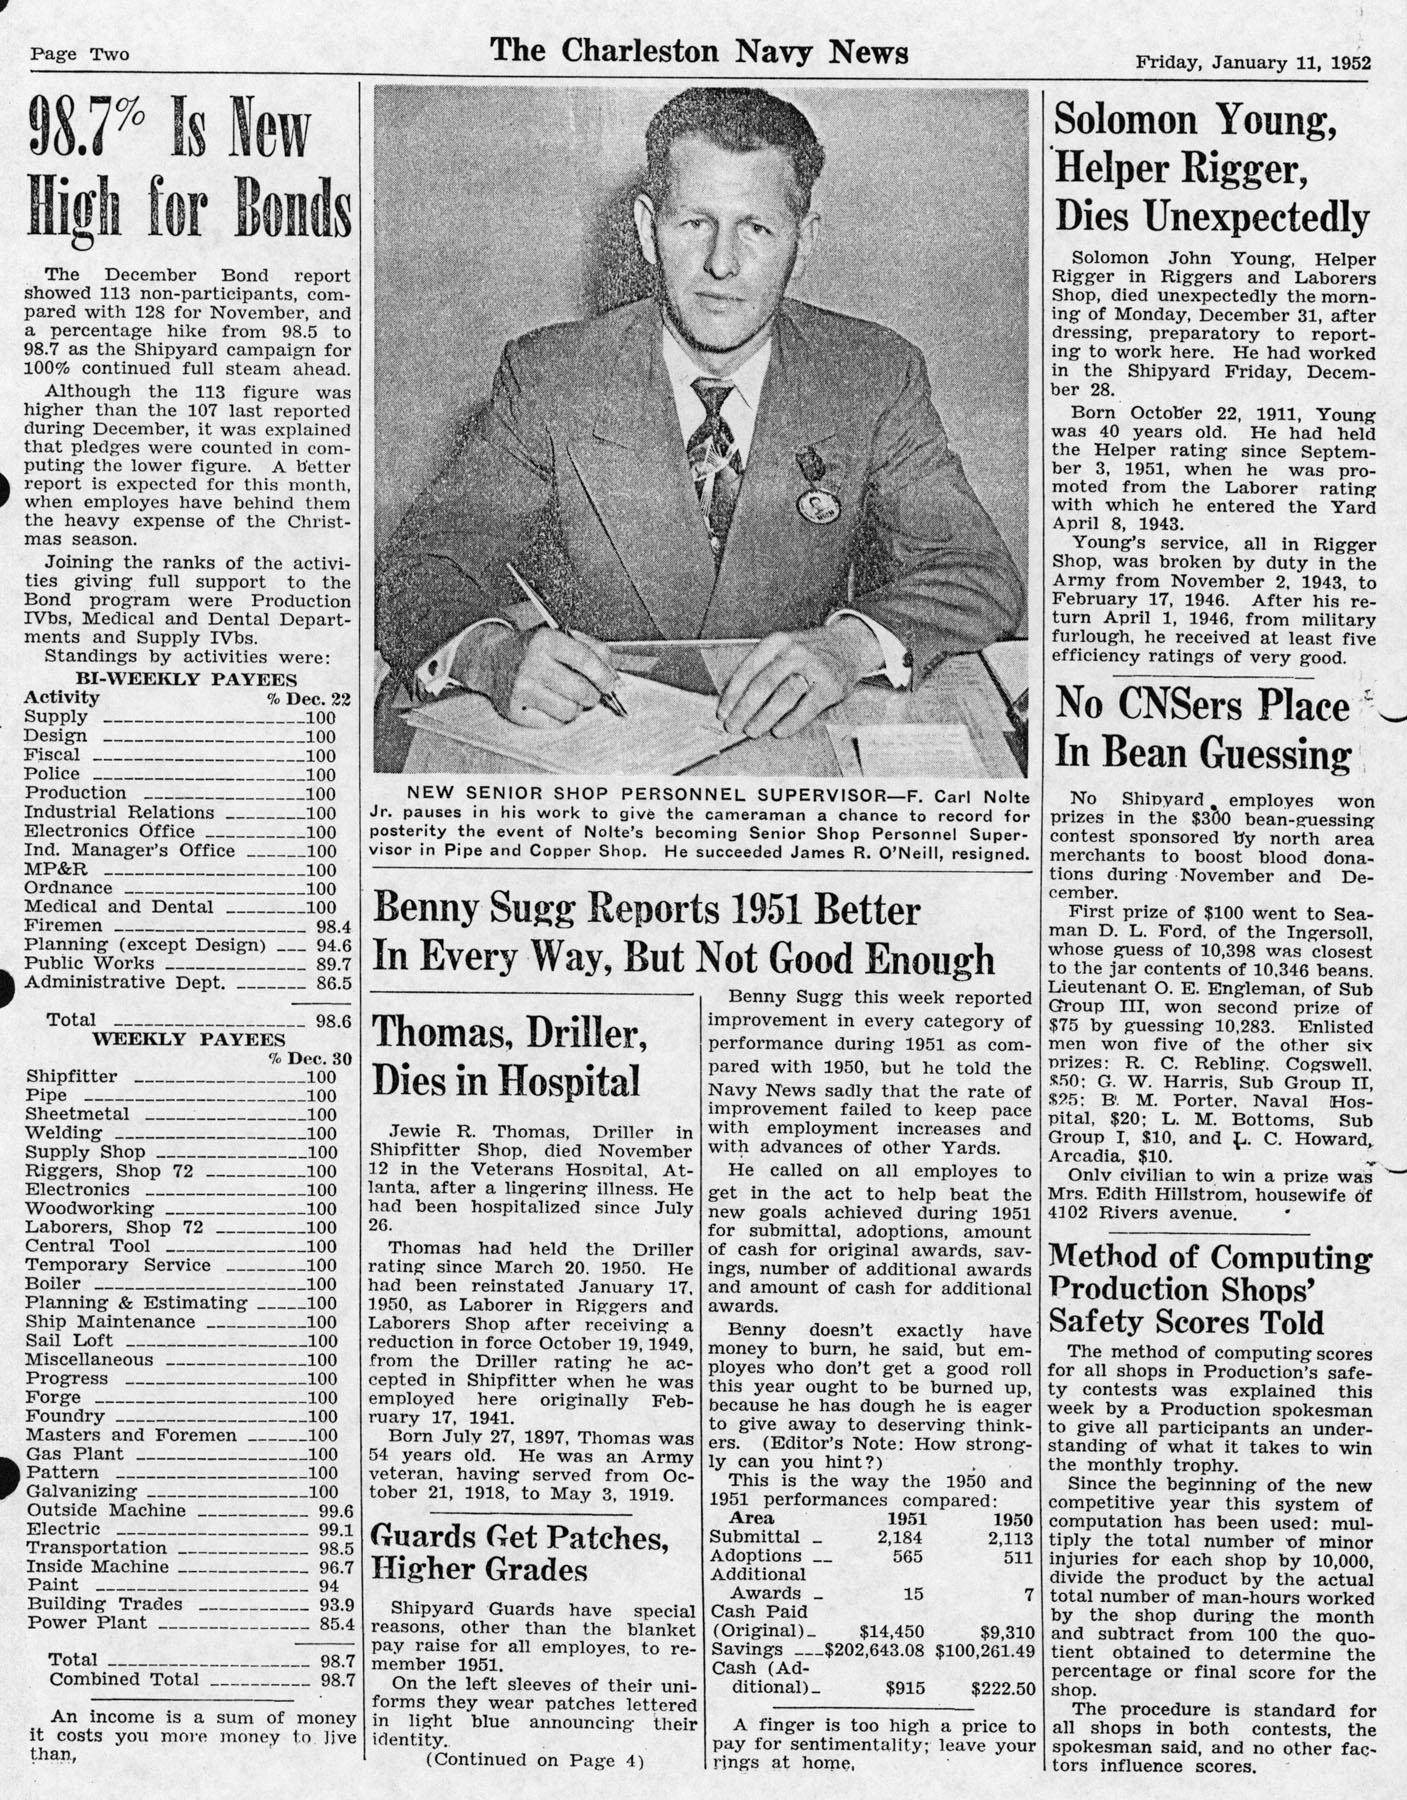 The Charleston Navy News, Volume 10, Edition 12, page ii